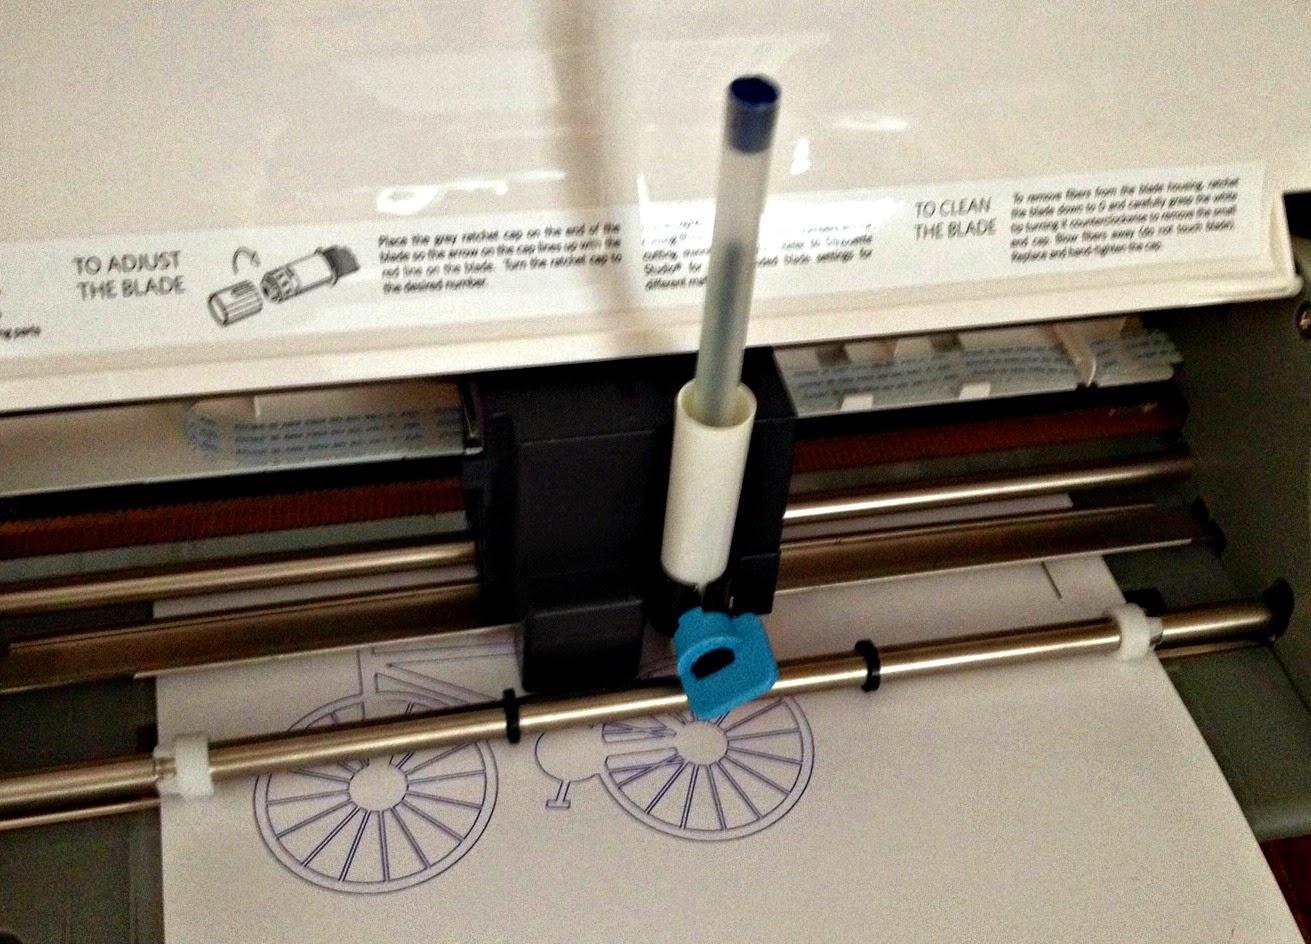 Sketch pen, holder, DIY, do it yourself